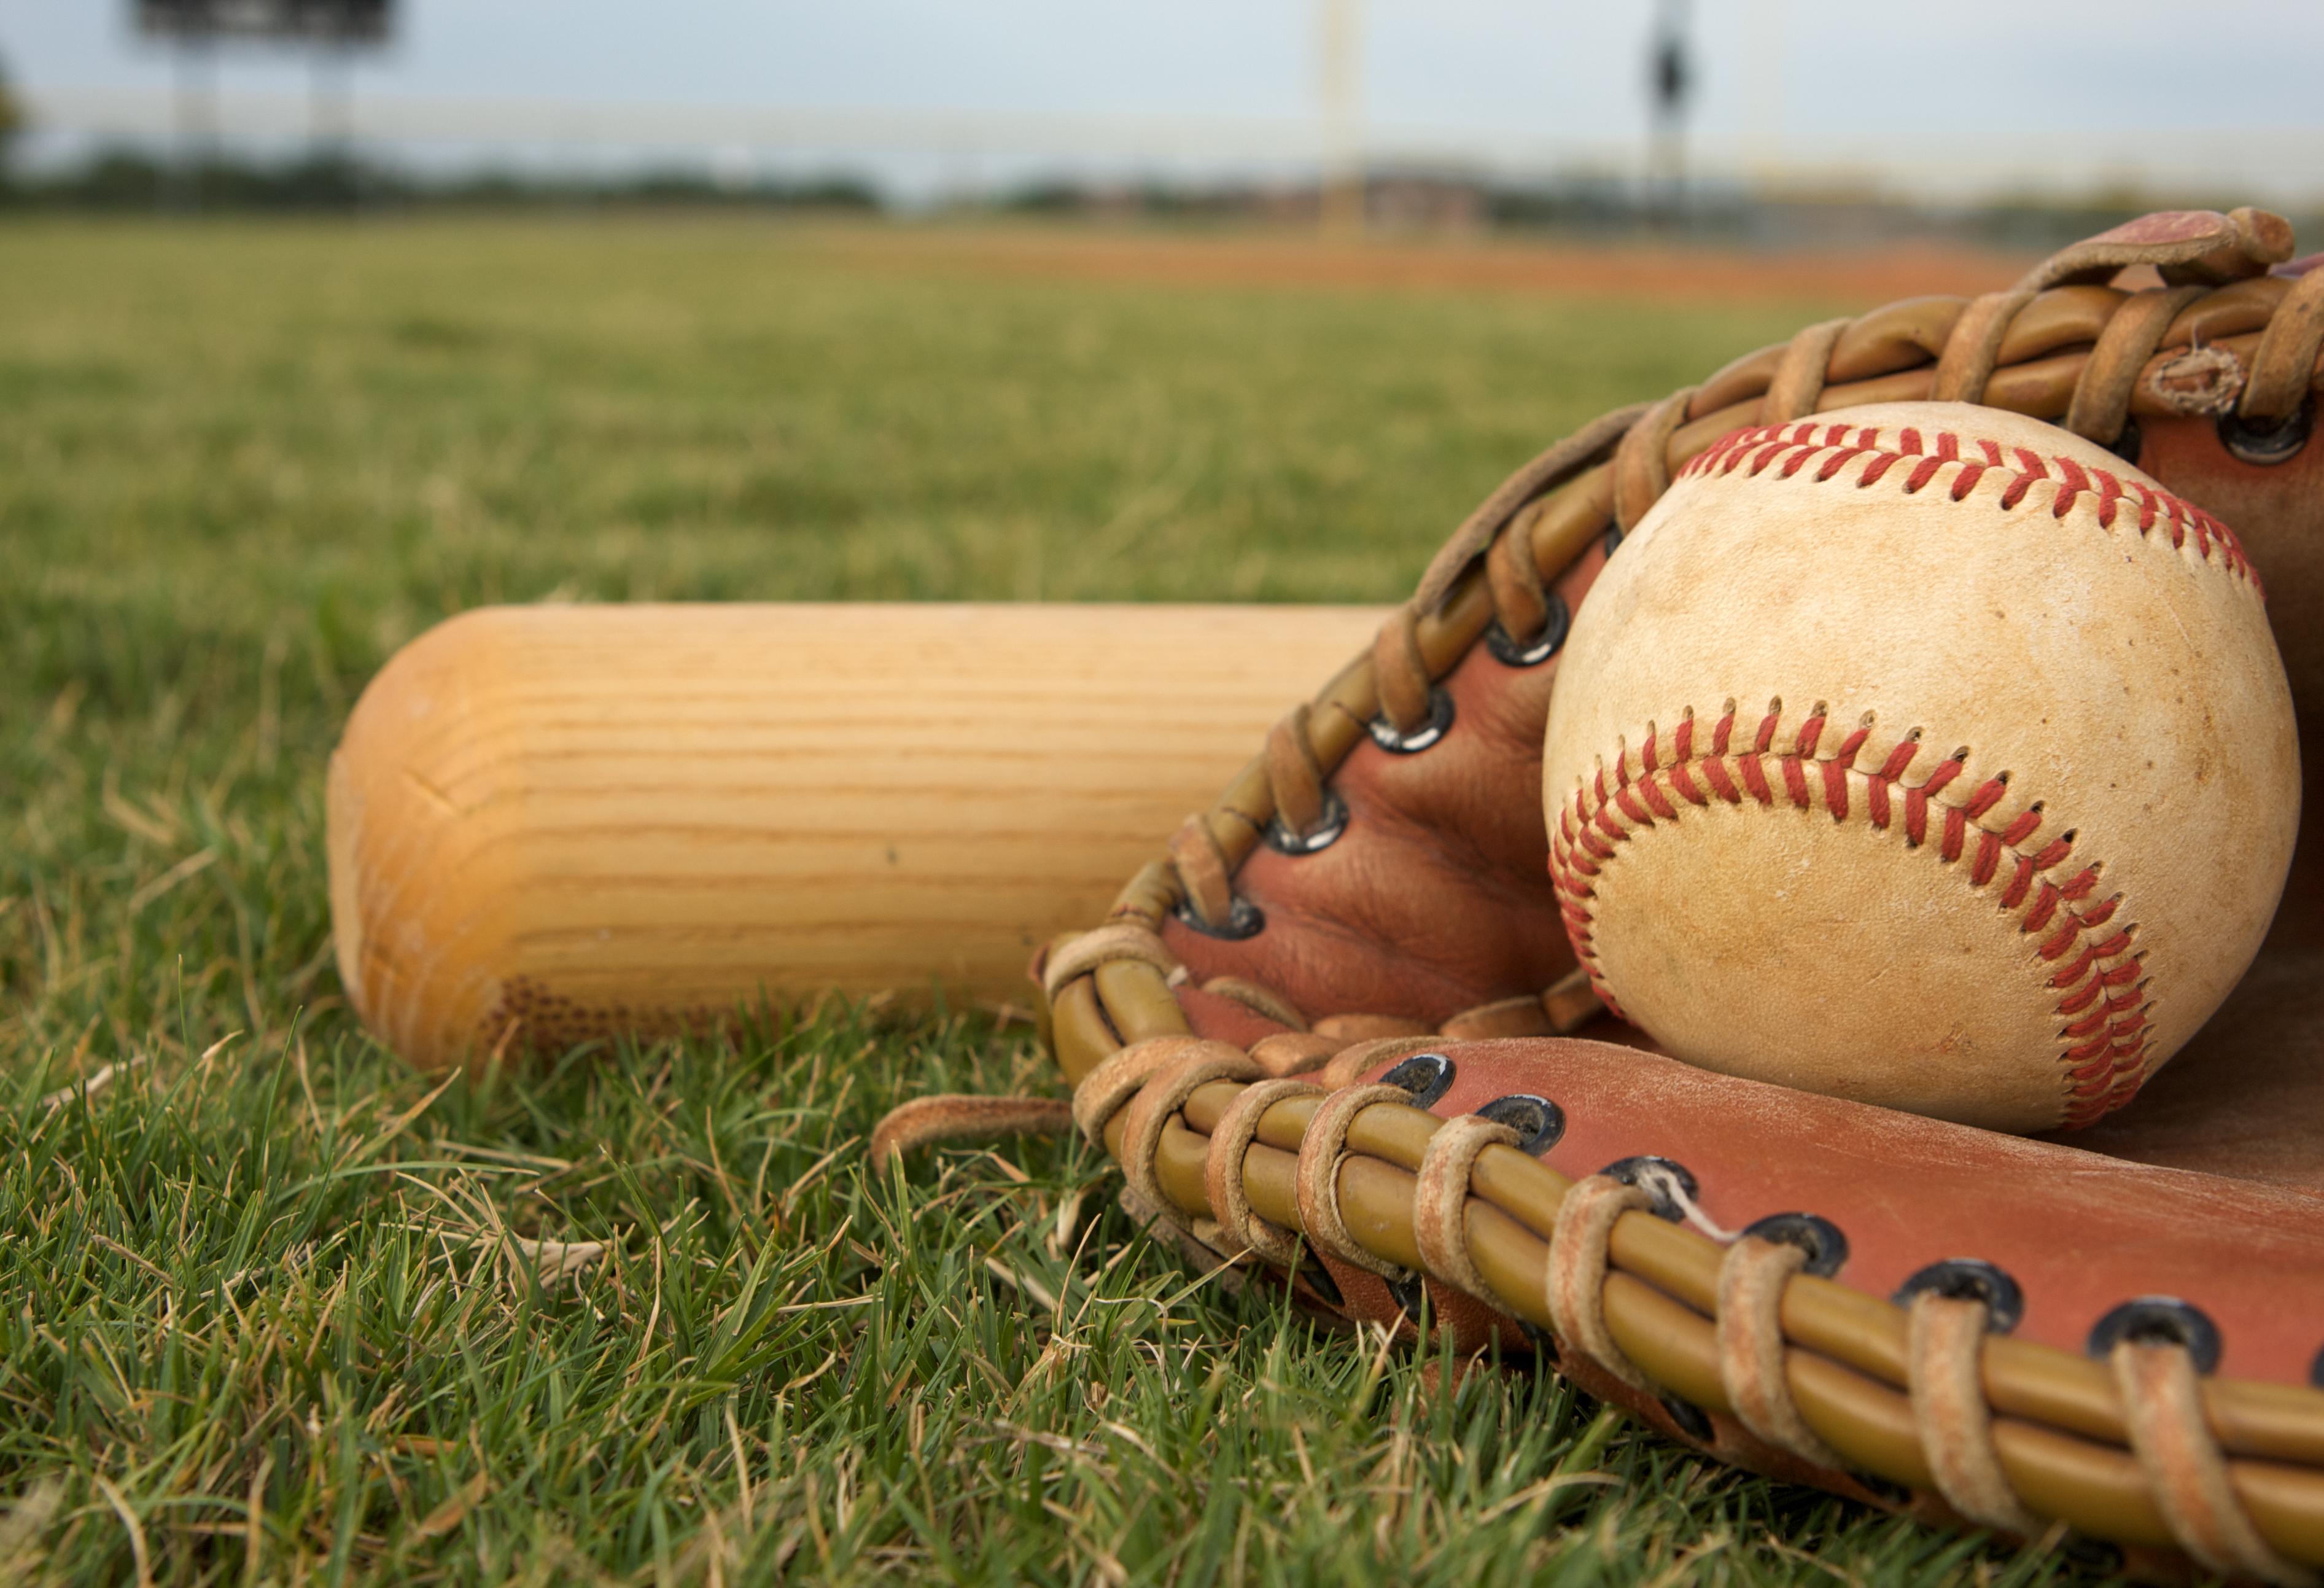 baseball-sports-grass